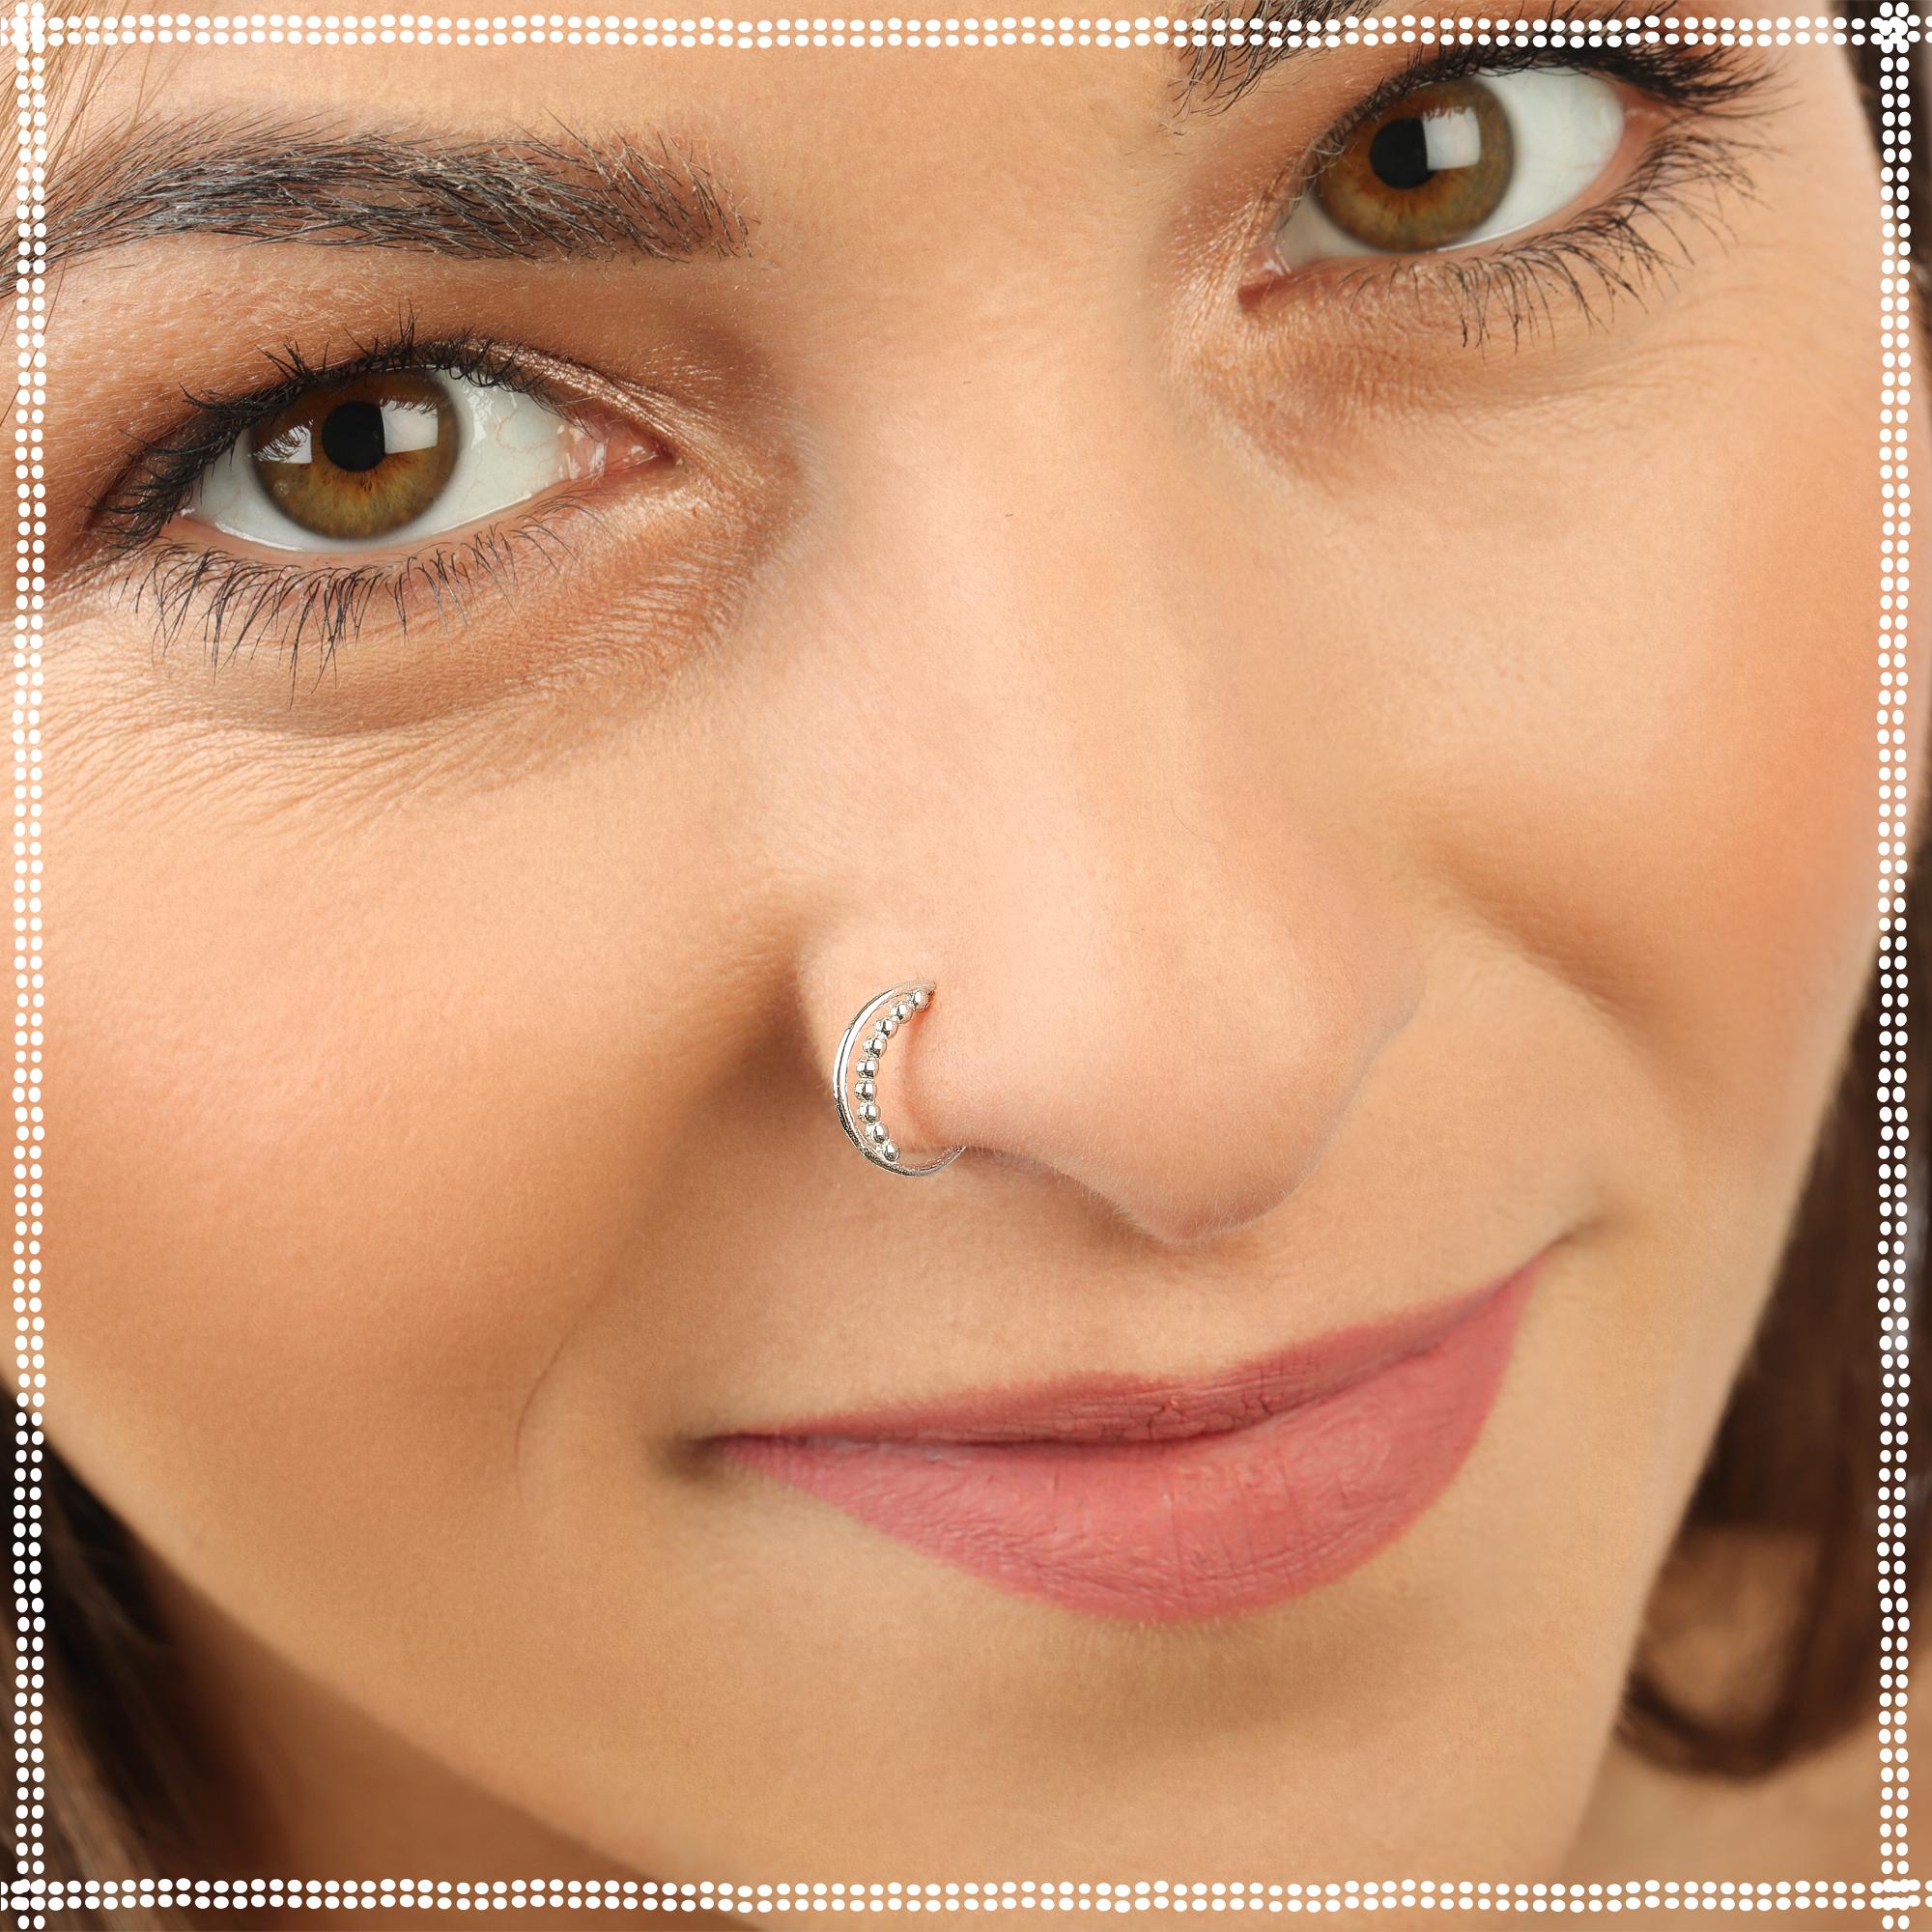 Kiwi Diamond Solid 14k Black Gold Nose Hoop Sizes 20g 16g Gold Nose Hoop Nose Rings Hoop Gold Body Jewellery